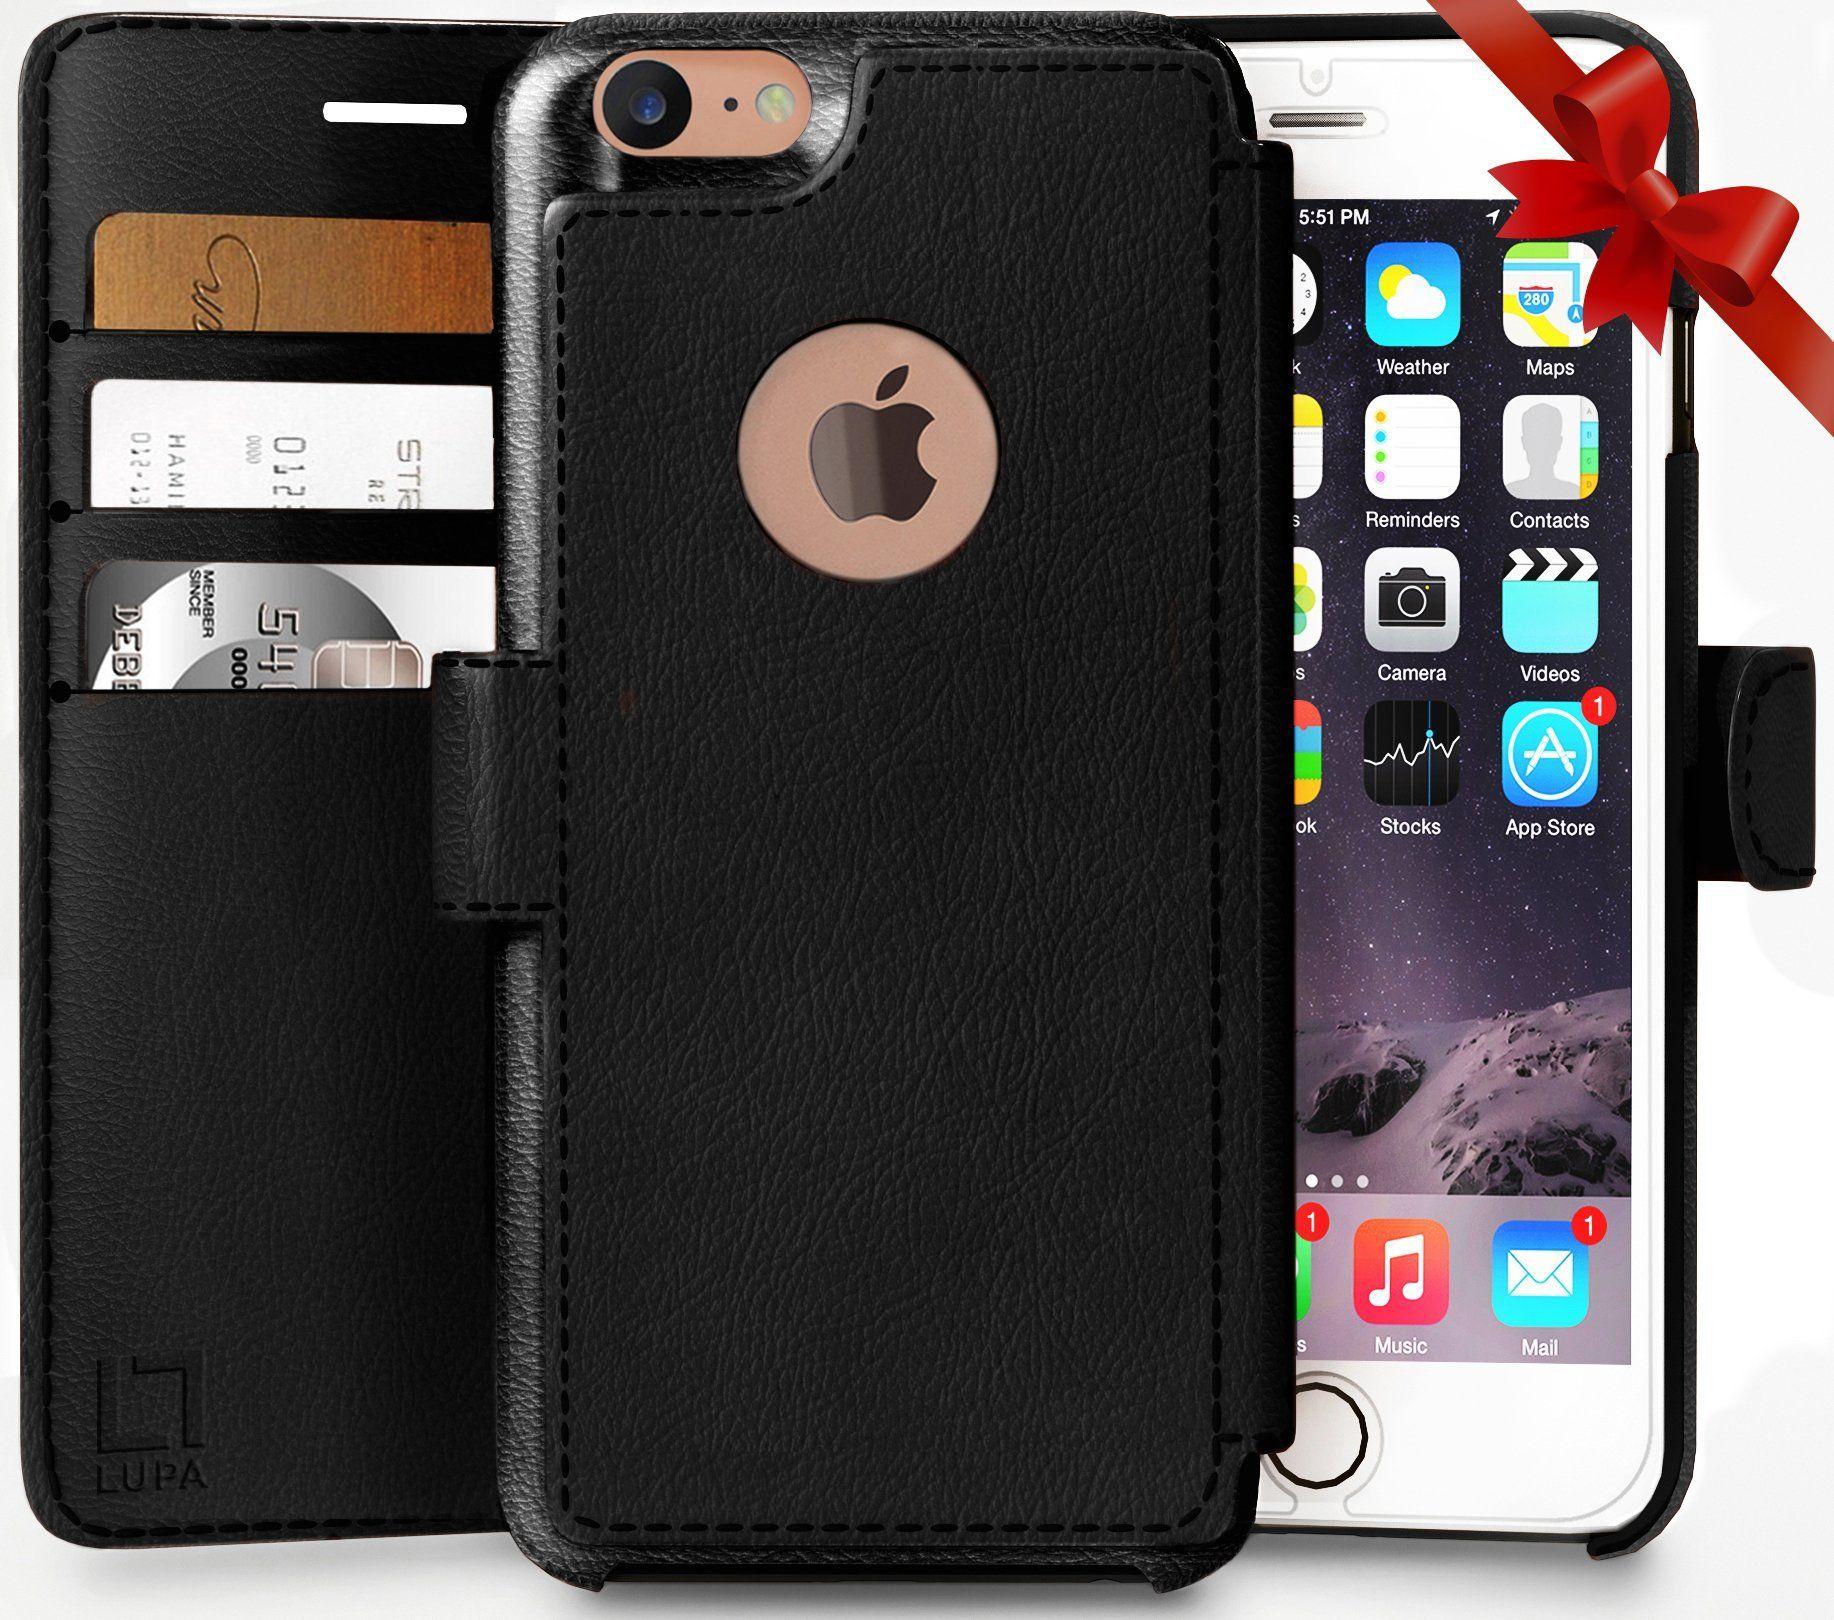 Lupa Iphone 6s Plus Wallet Case Iphone 6 Plus Wallet Case